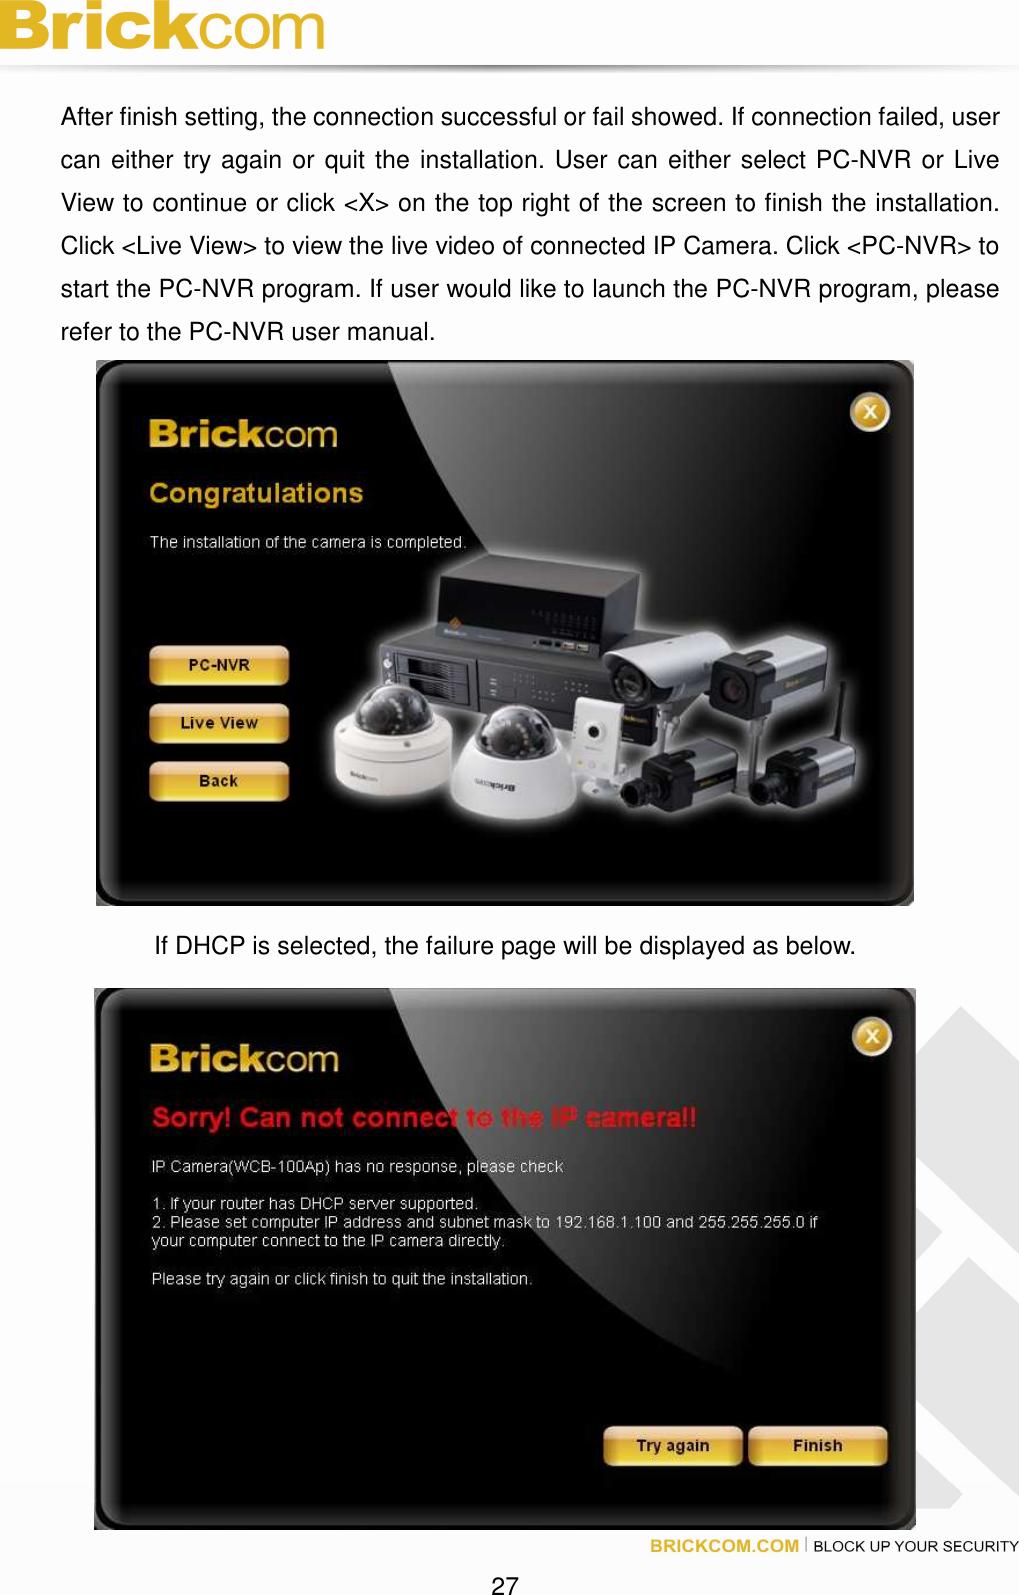 Brickcom WFB-100A Megapixel Wireless Fixed Box Network